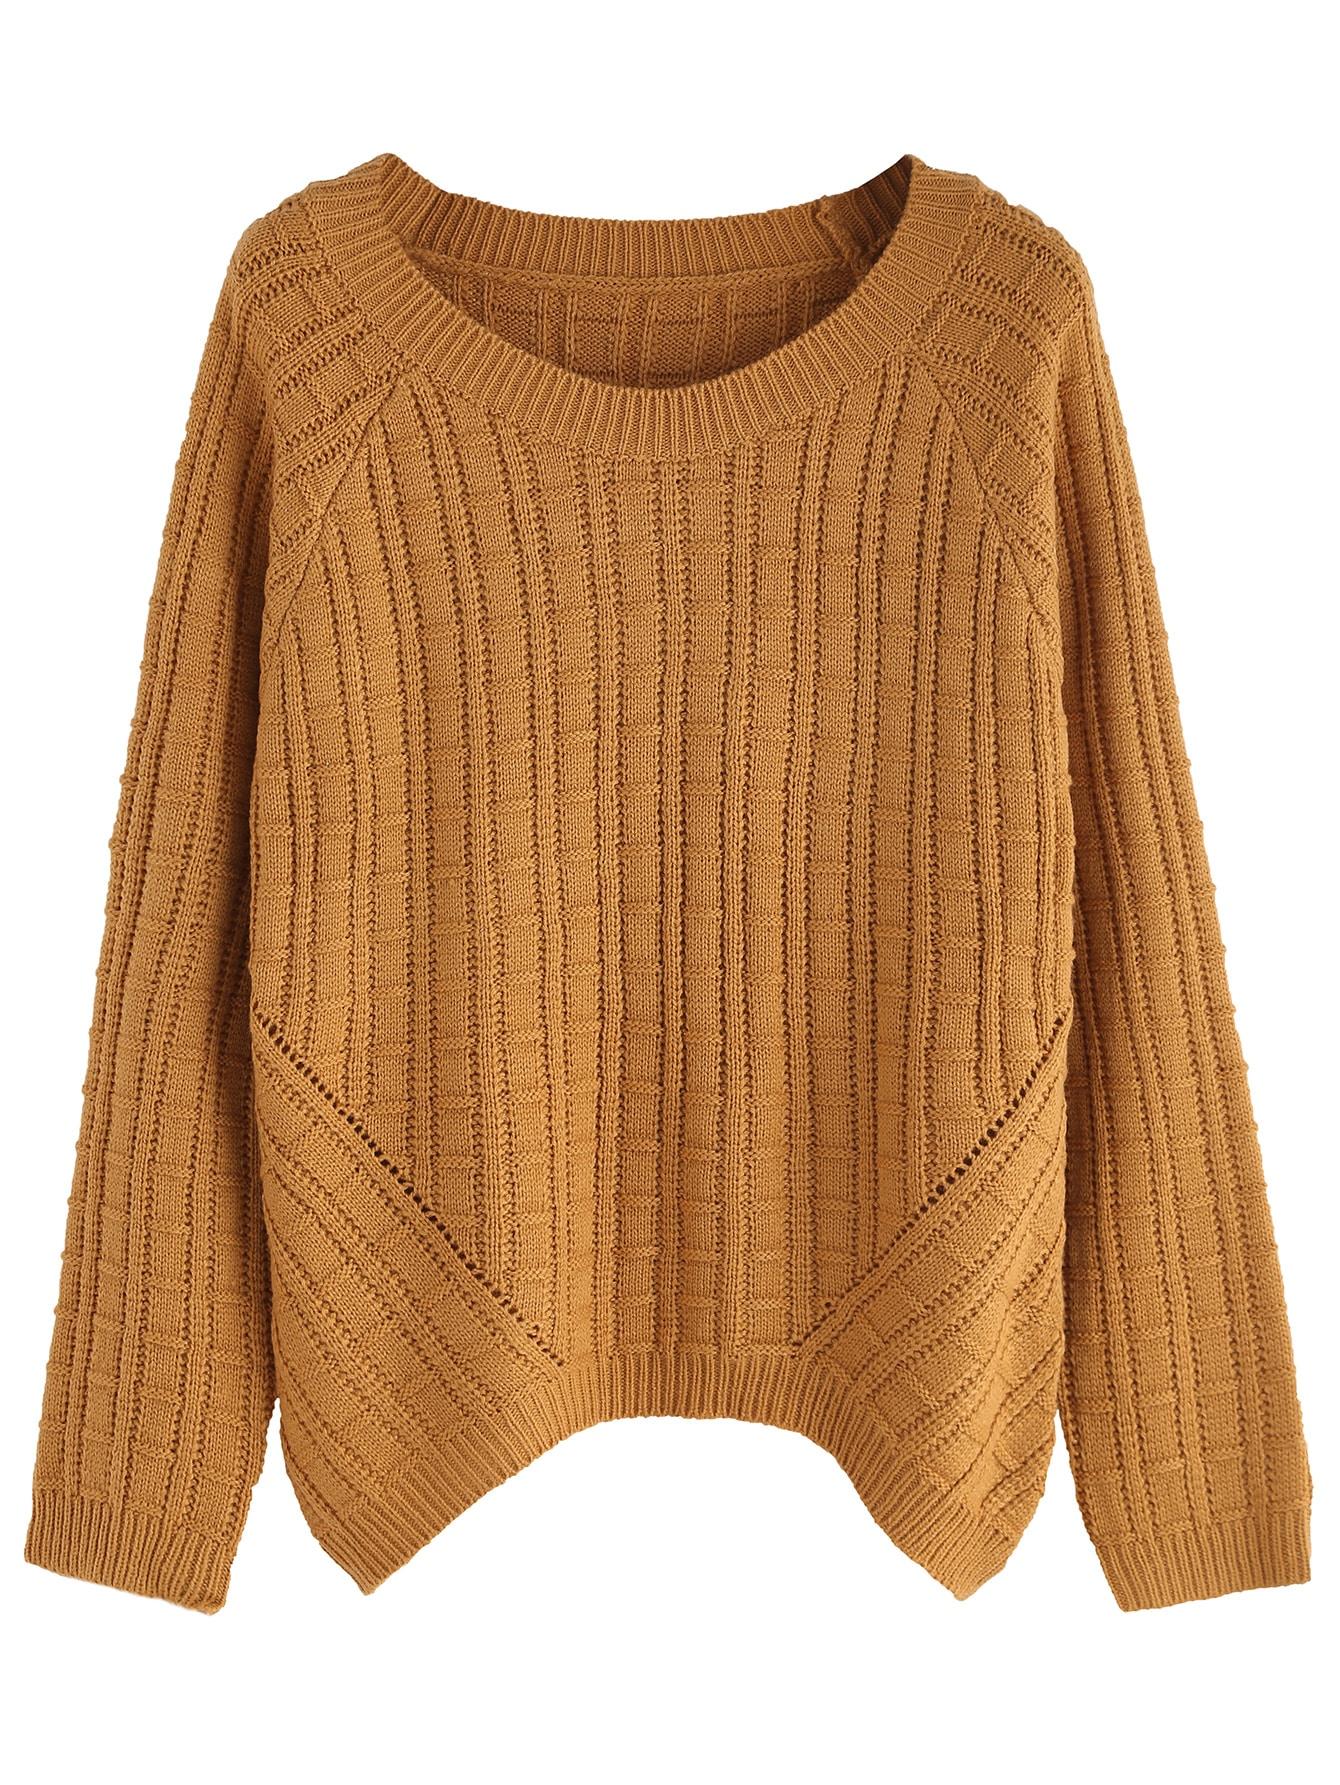 sweater160915002_2